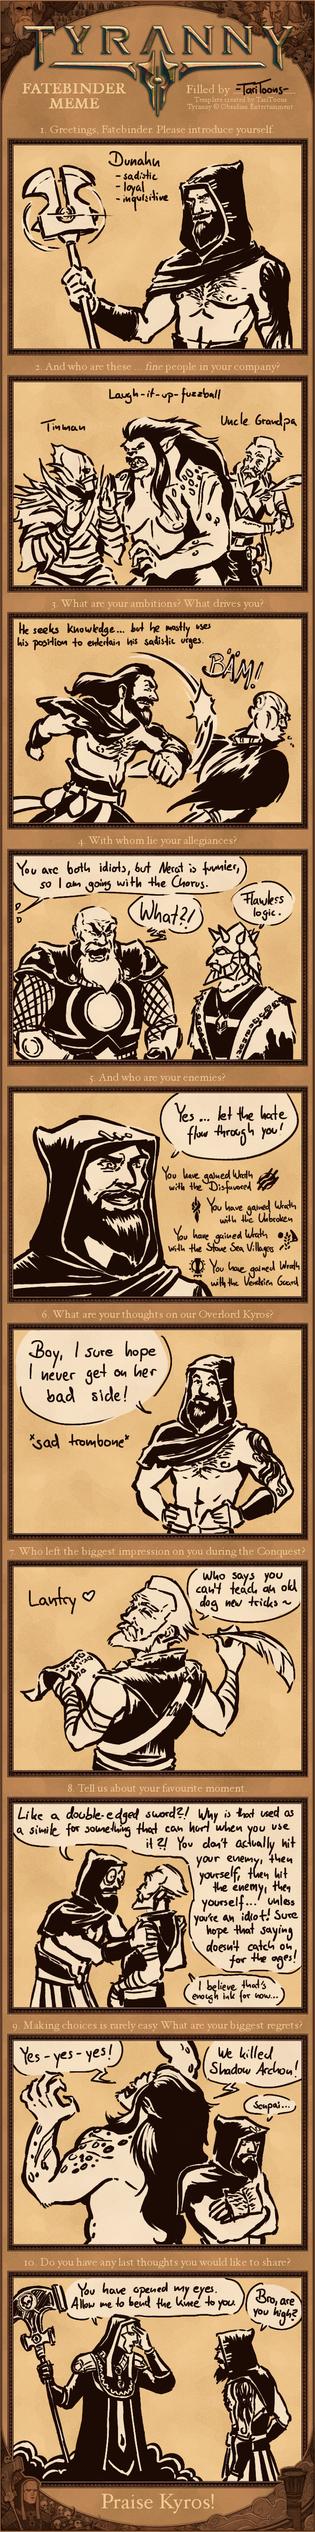 Tyranny: Fatebinder Meme - Dunahn by TariToons